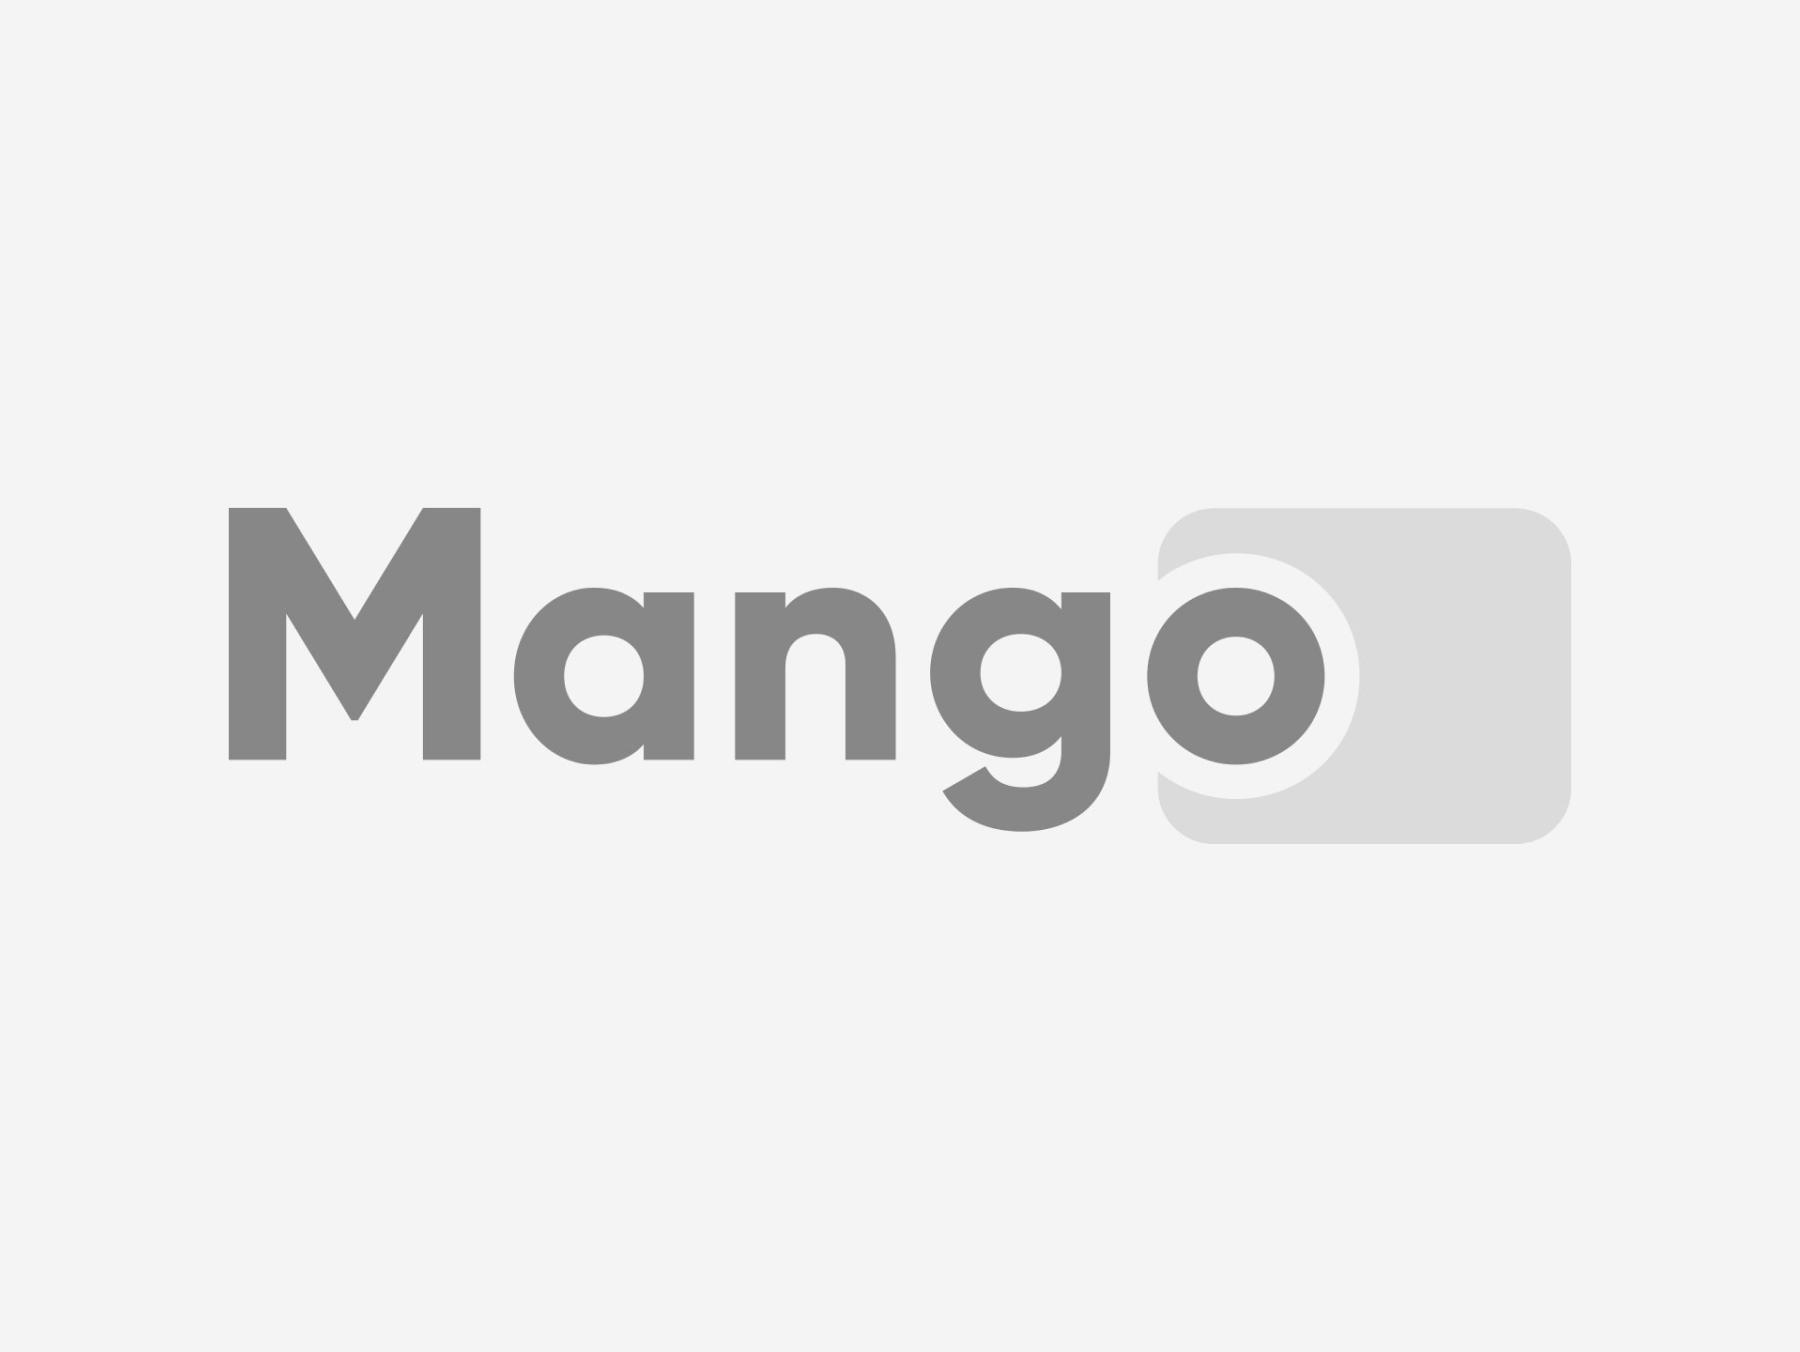 pareri Set Tenis de Masa Spokey Standard forum, pret, probleme